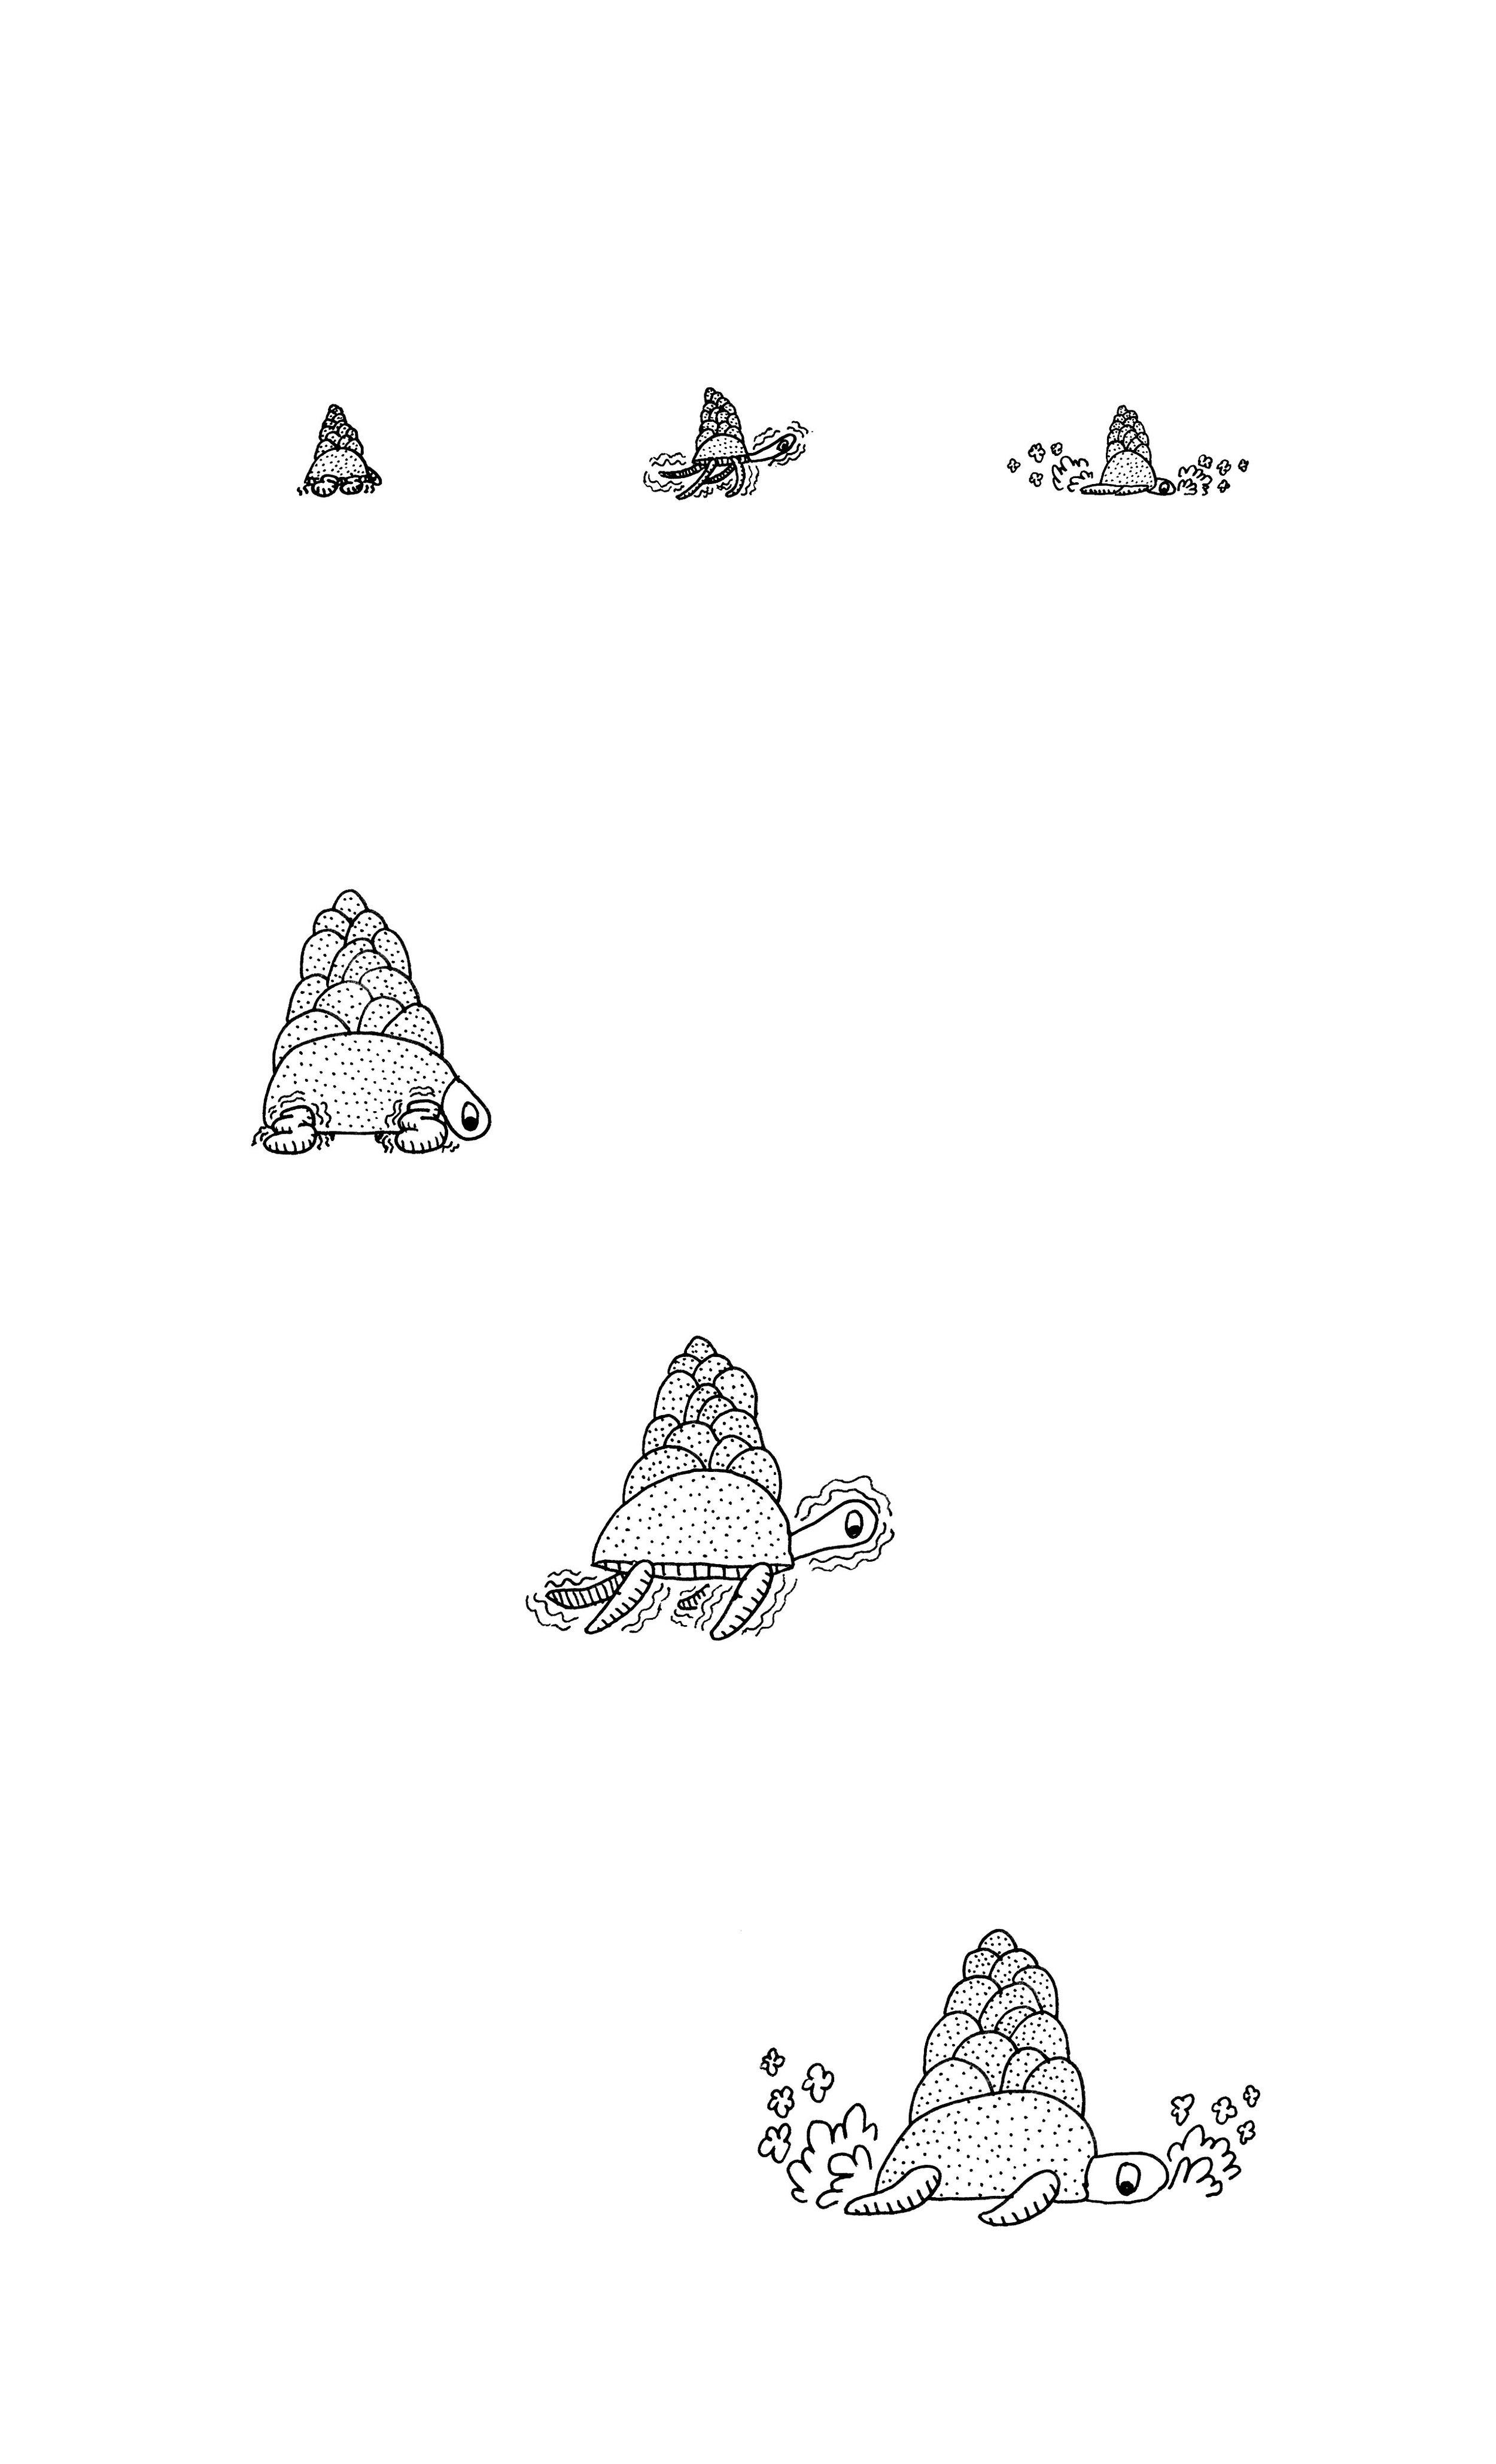 oscillator_page11.jpg